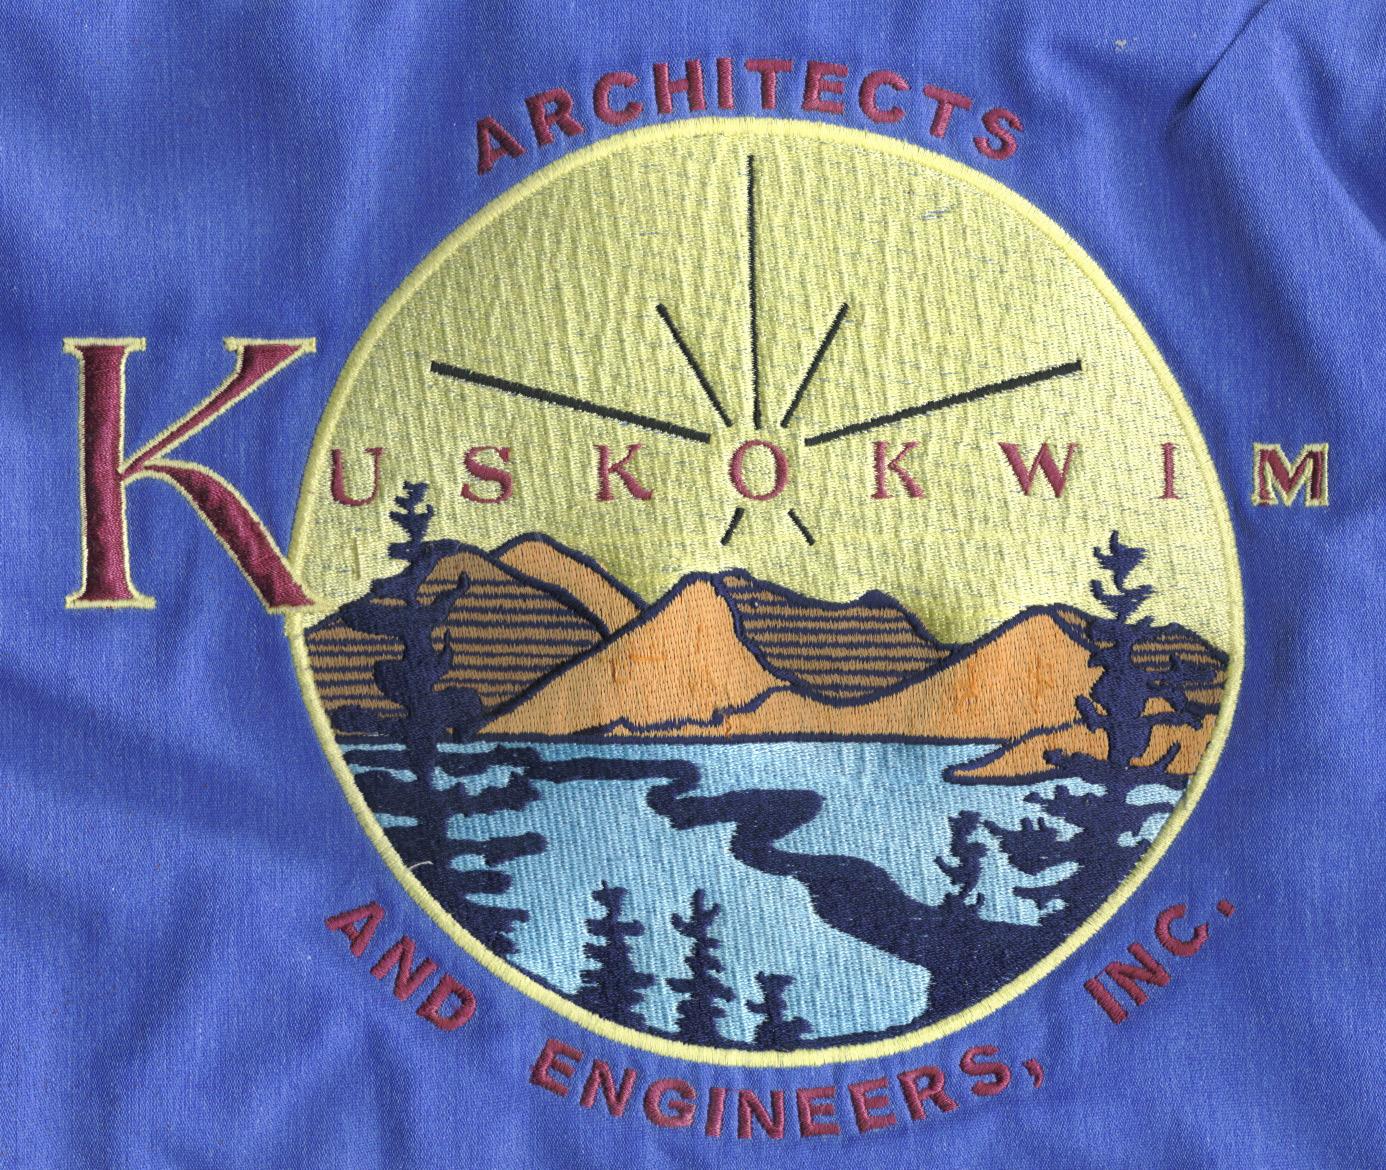 Kuskokwim Architects & Engineers